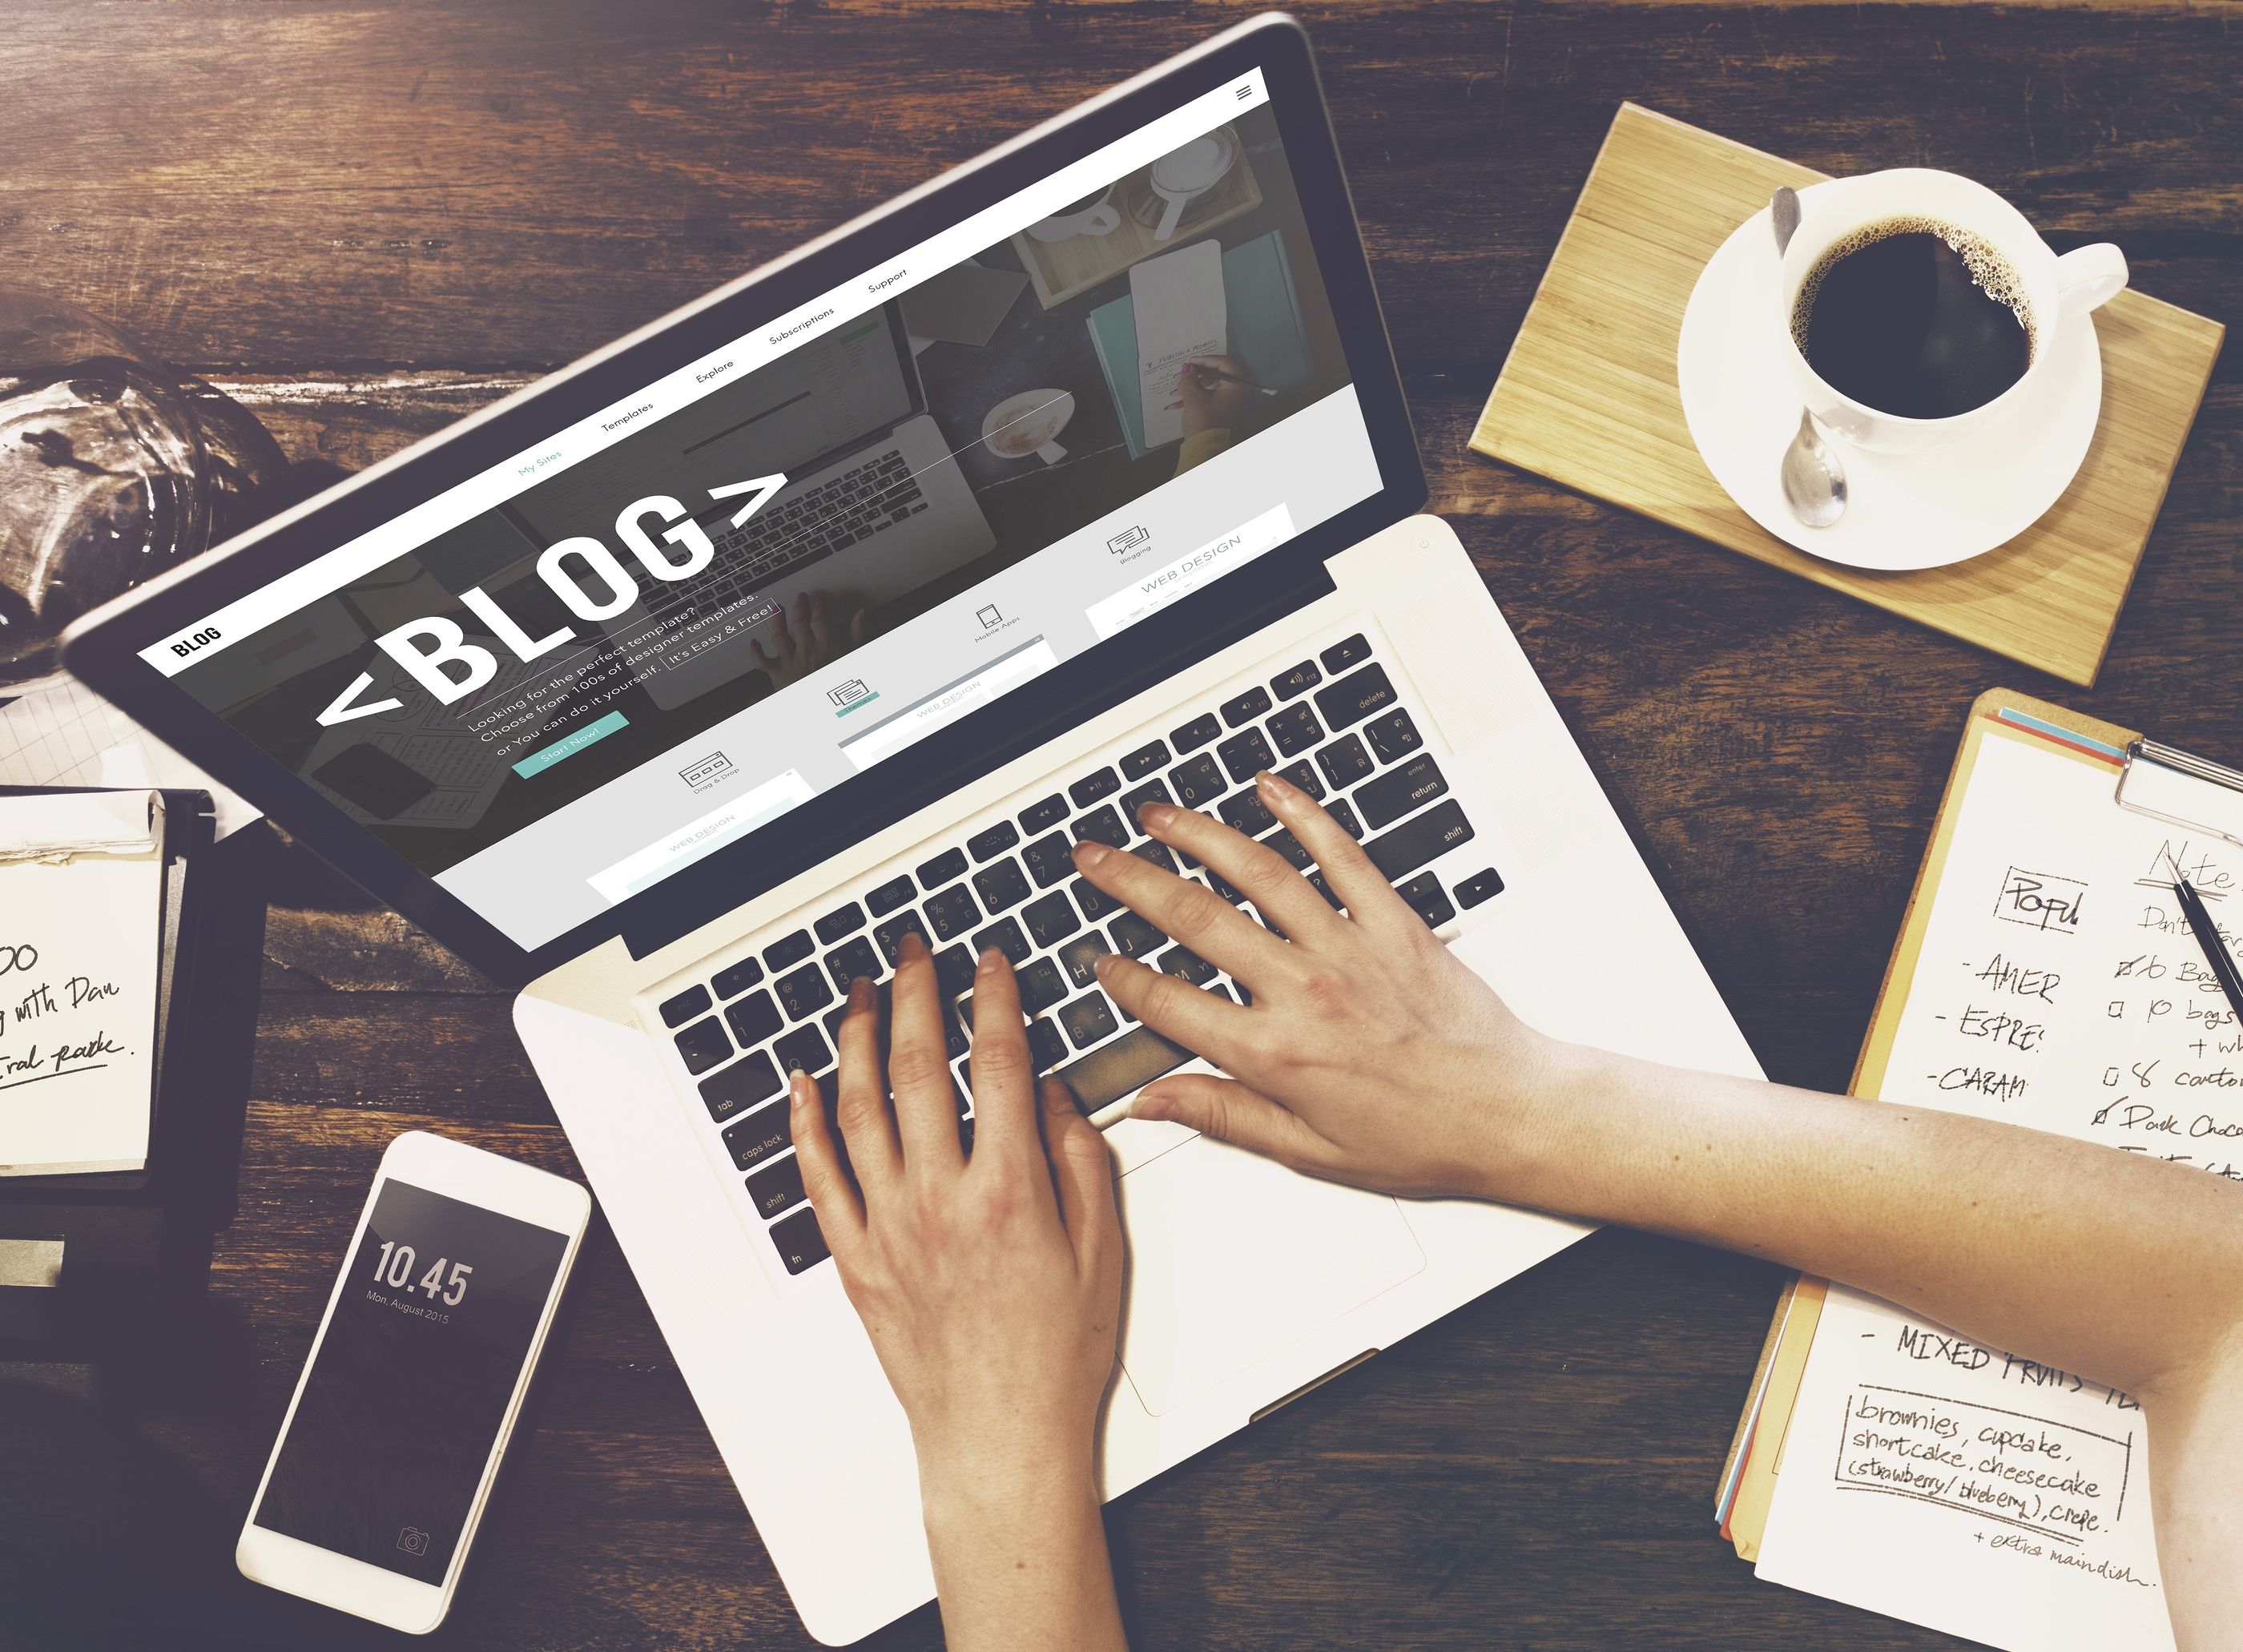 bigstock-Blog-Blogging-Homepage-Social--134171063